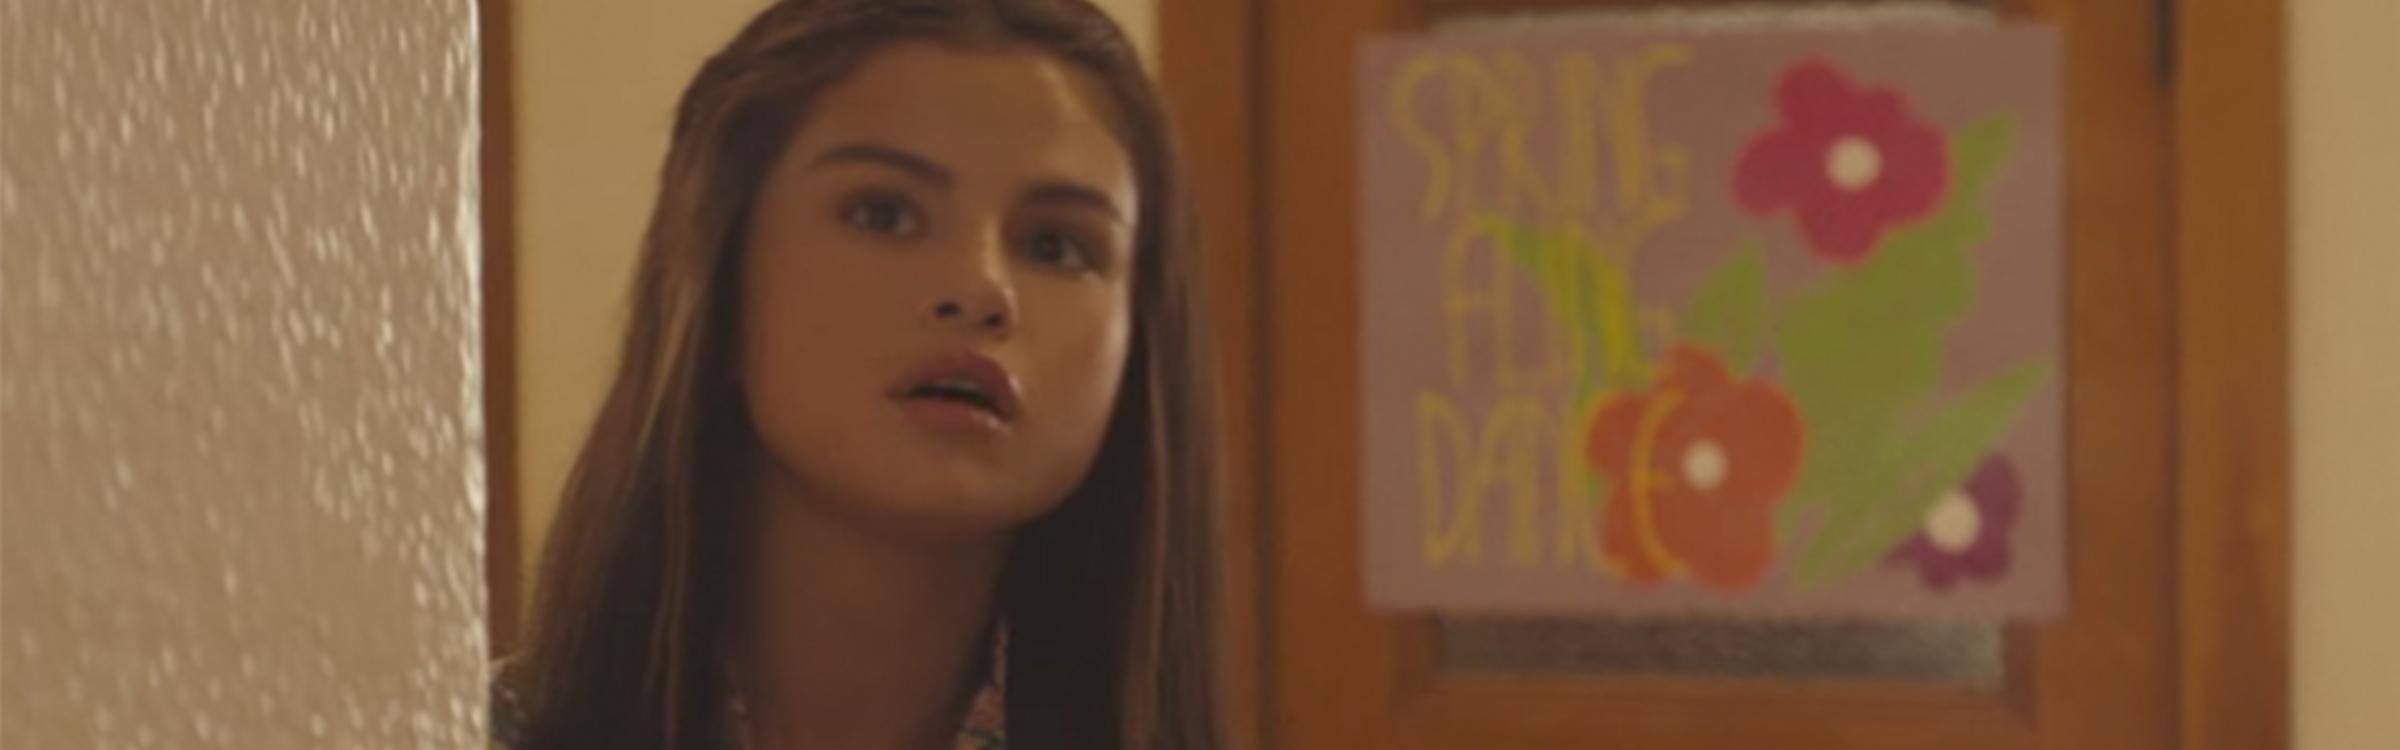 Selena clip header